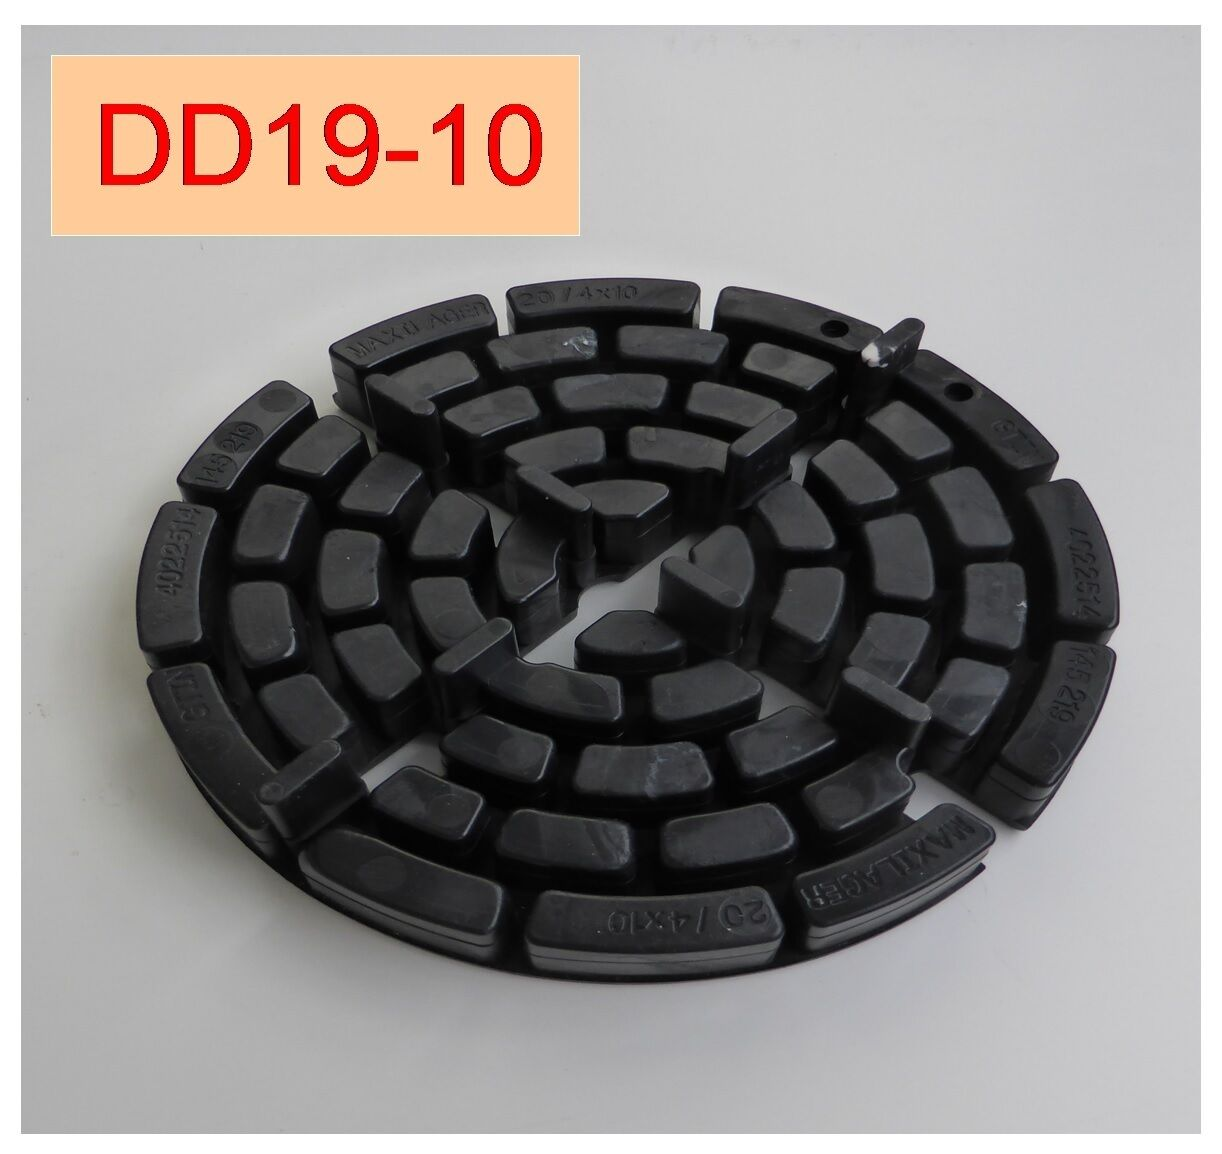 120 Plattenlager DD19-10, 20mm hoch, Steghöhe 10mm, Fuge 4mm, 150mm Durchm. ,,